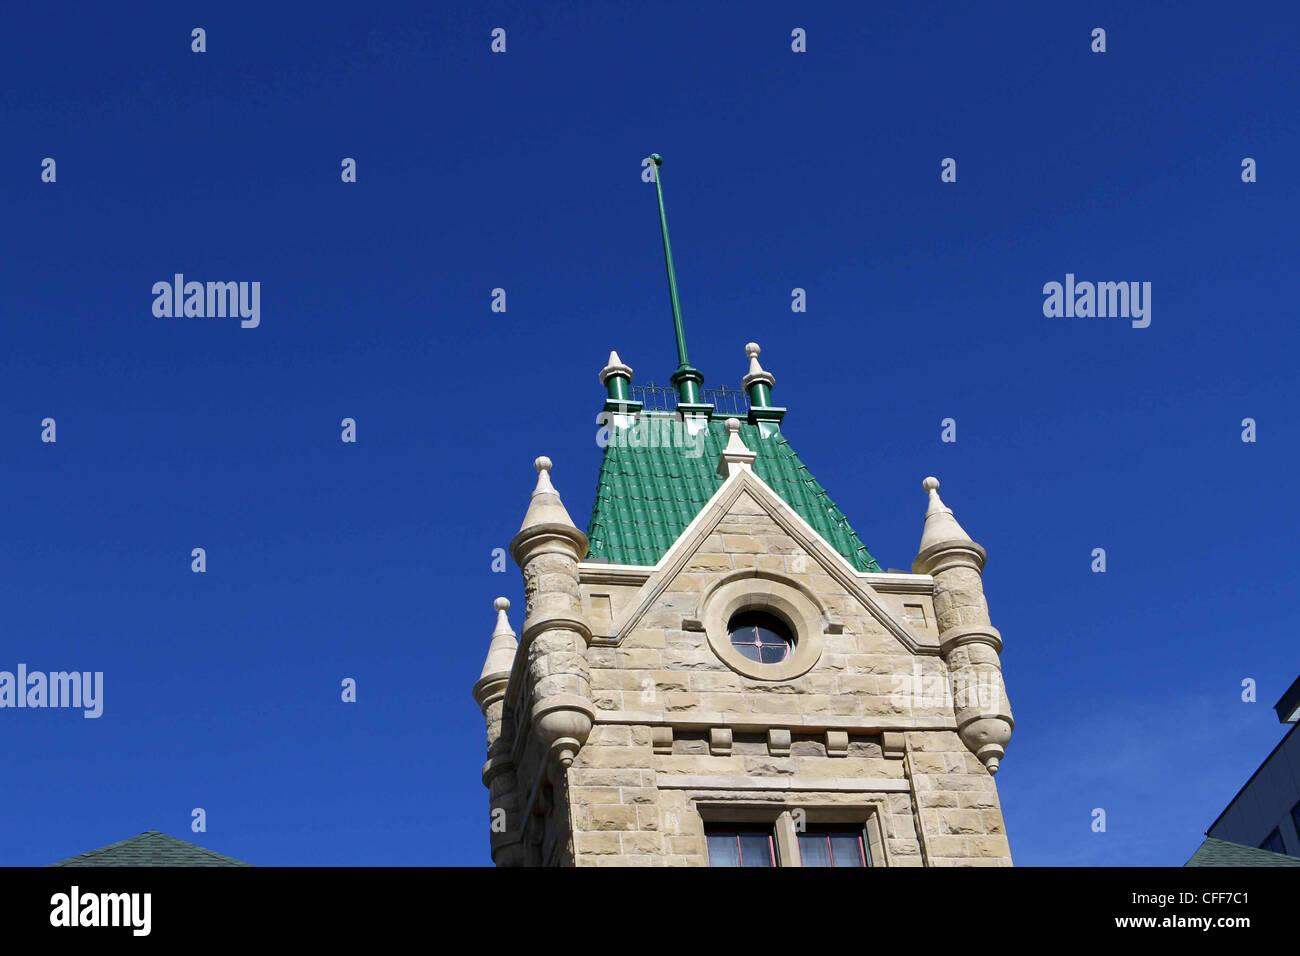 Old sandstone school building in downtown Calgary, Alberta, Canada. - Stock Image